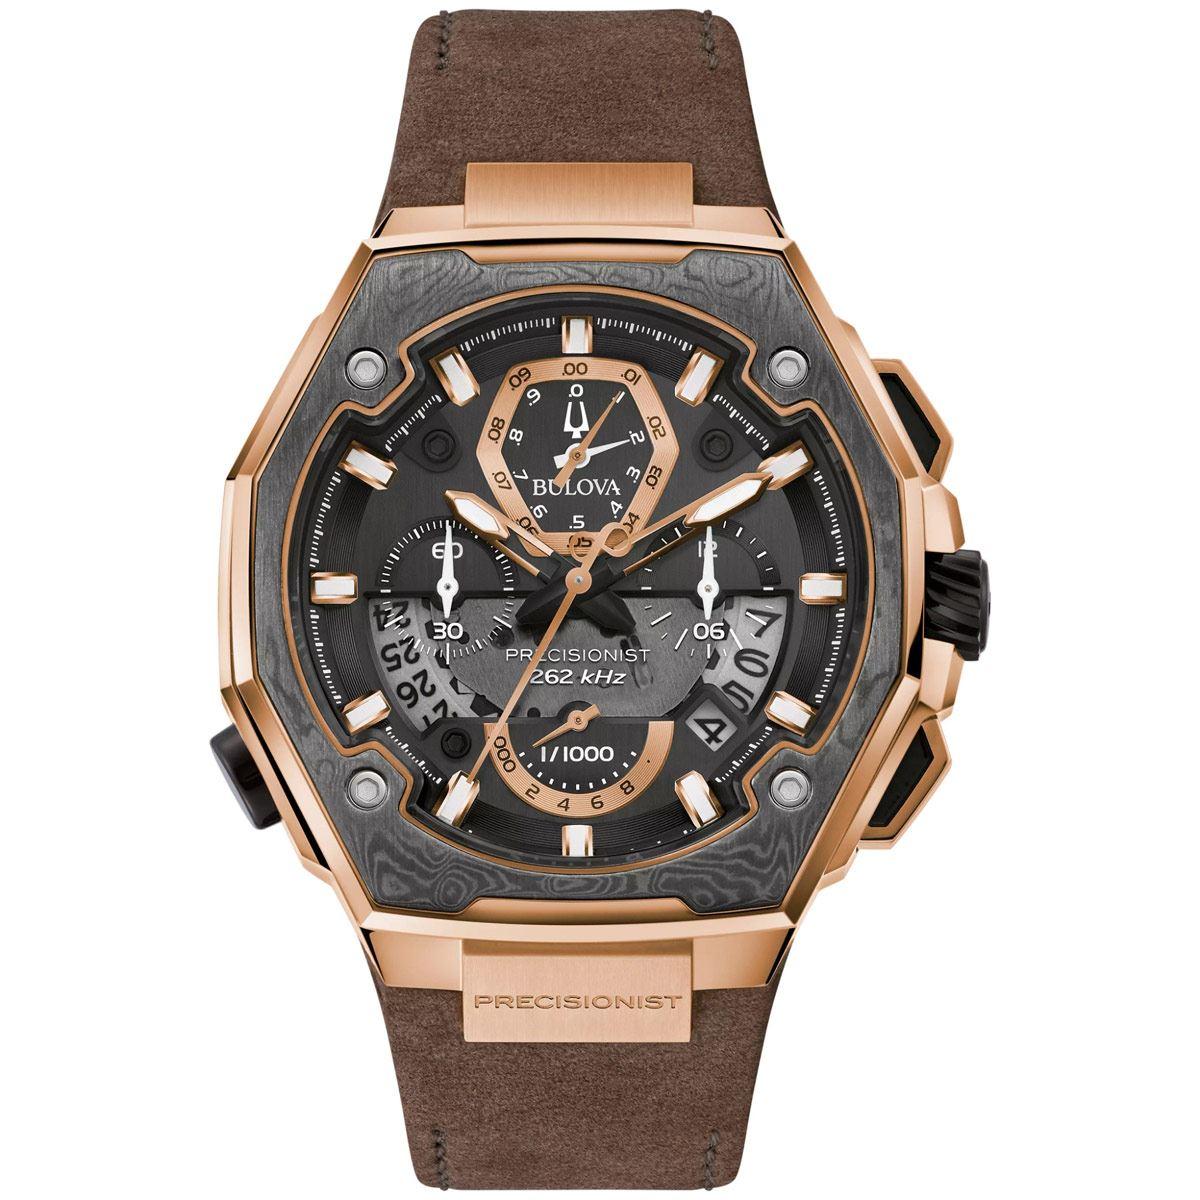 Reloj de pulso Bulova para Caballero 98B356 Colección Precisionist